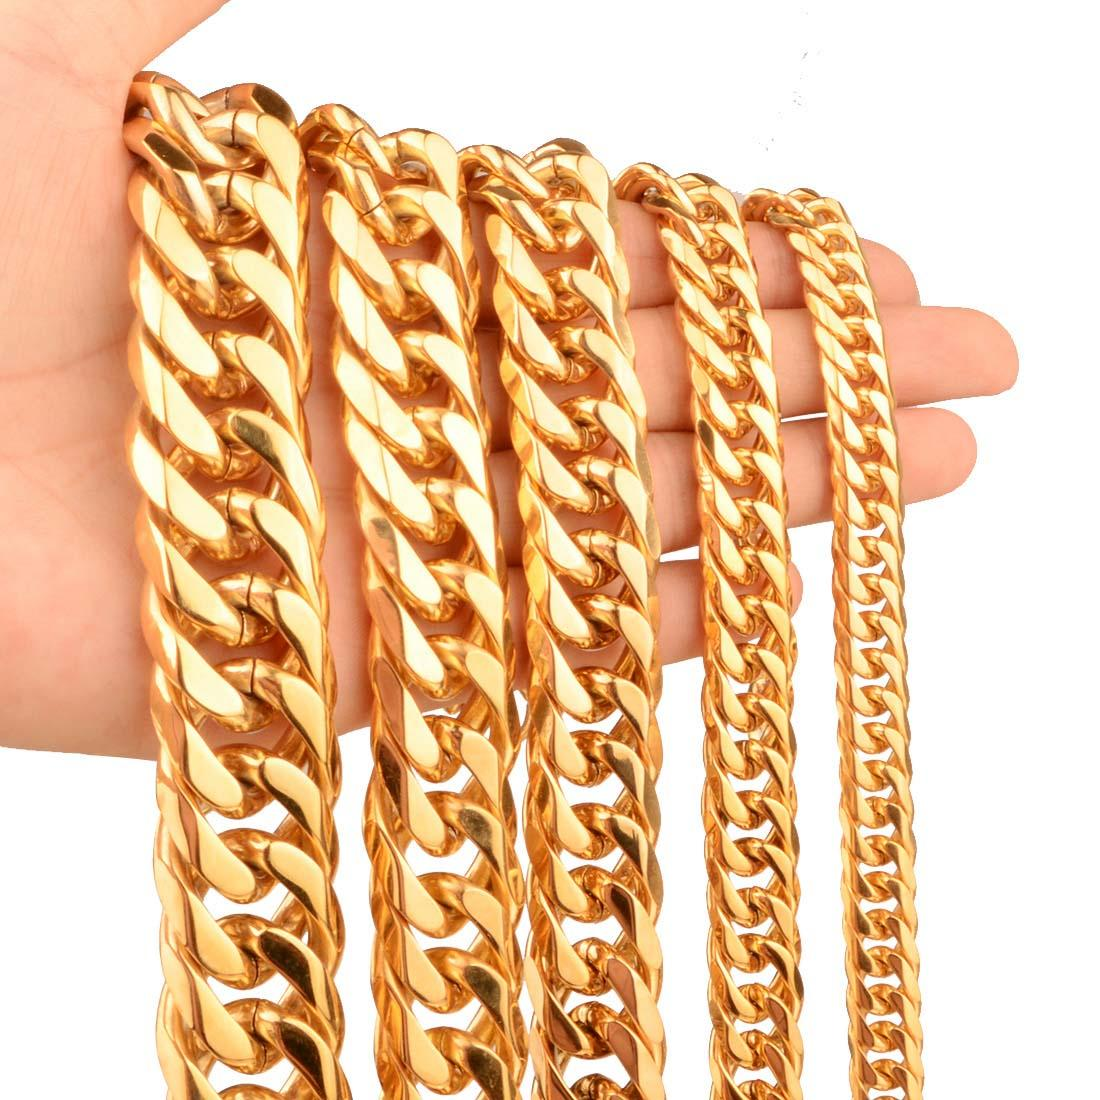 Männer Frauen Hip Hop goldene Ketten 316L Edelstahl 6 Seiten hoch polierten 18K Gold überzieht Hip Hop Halsketten-Punkschmucksache-9mm-21mm Breite